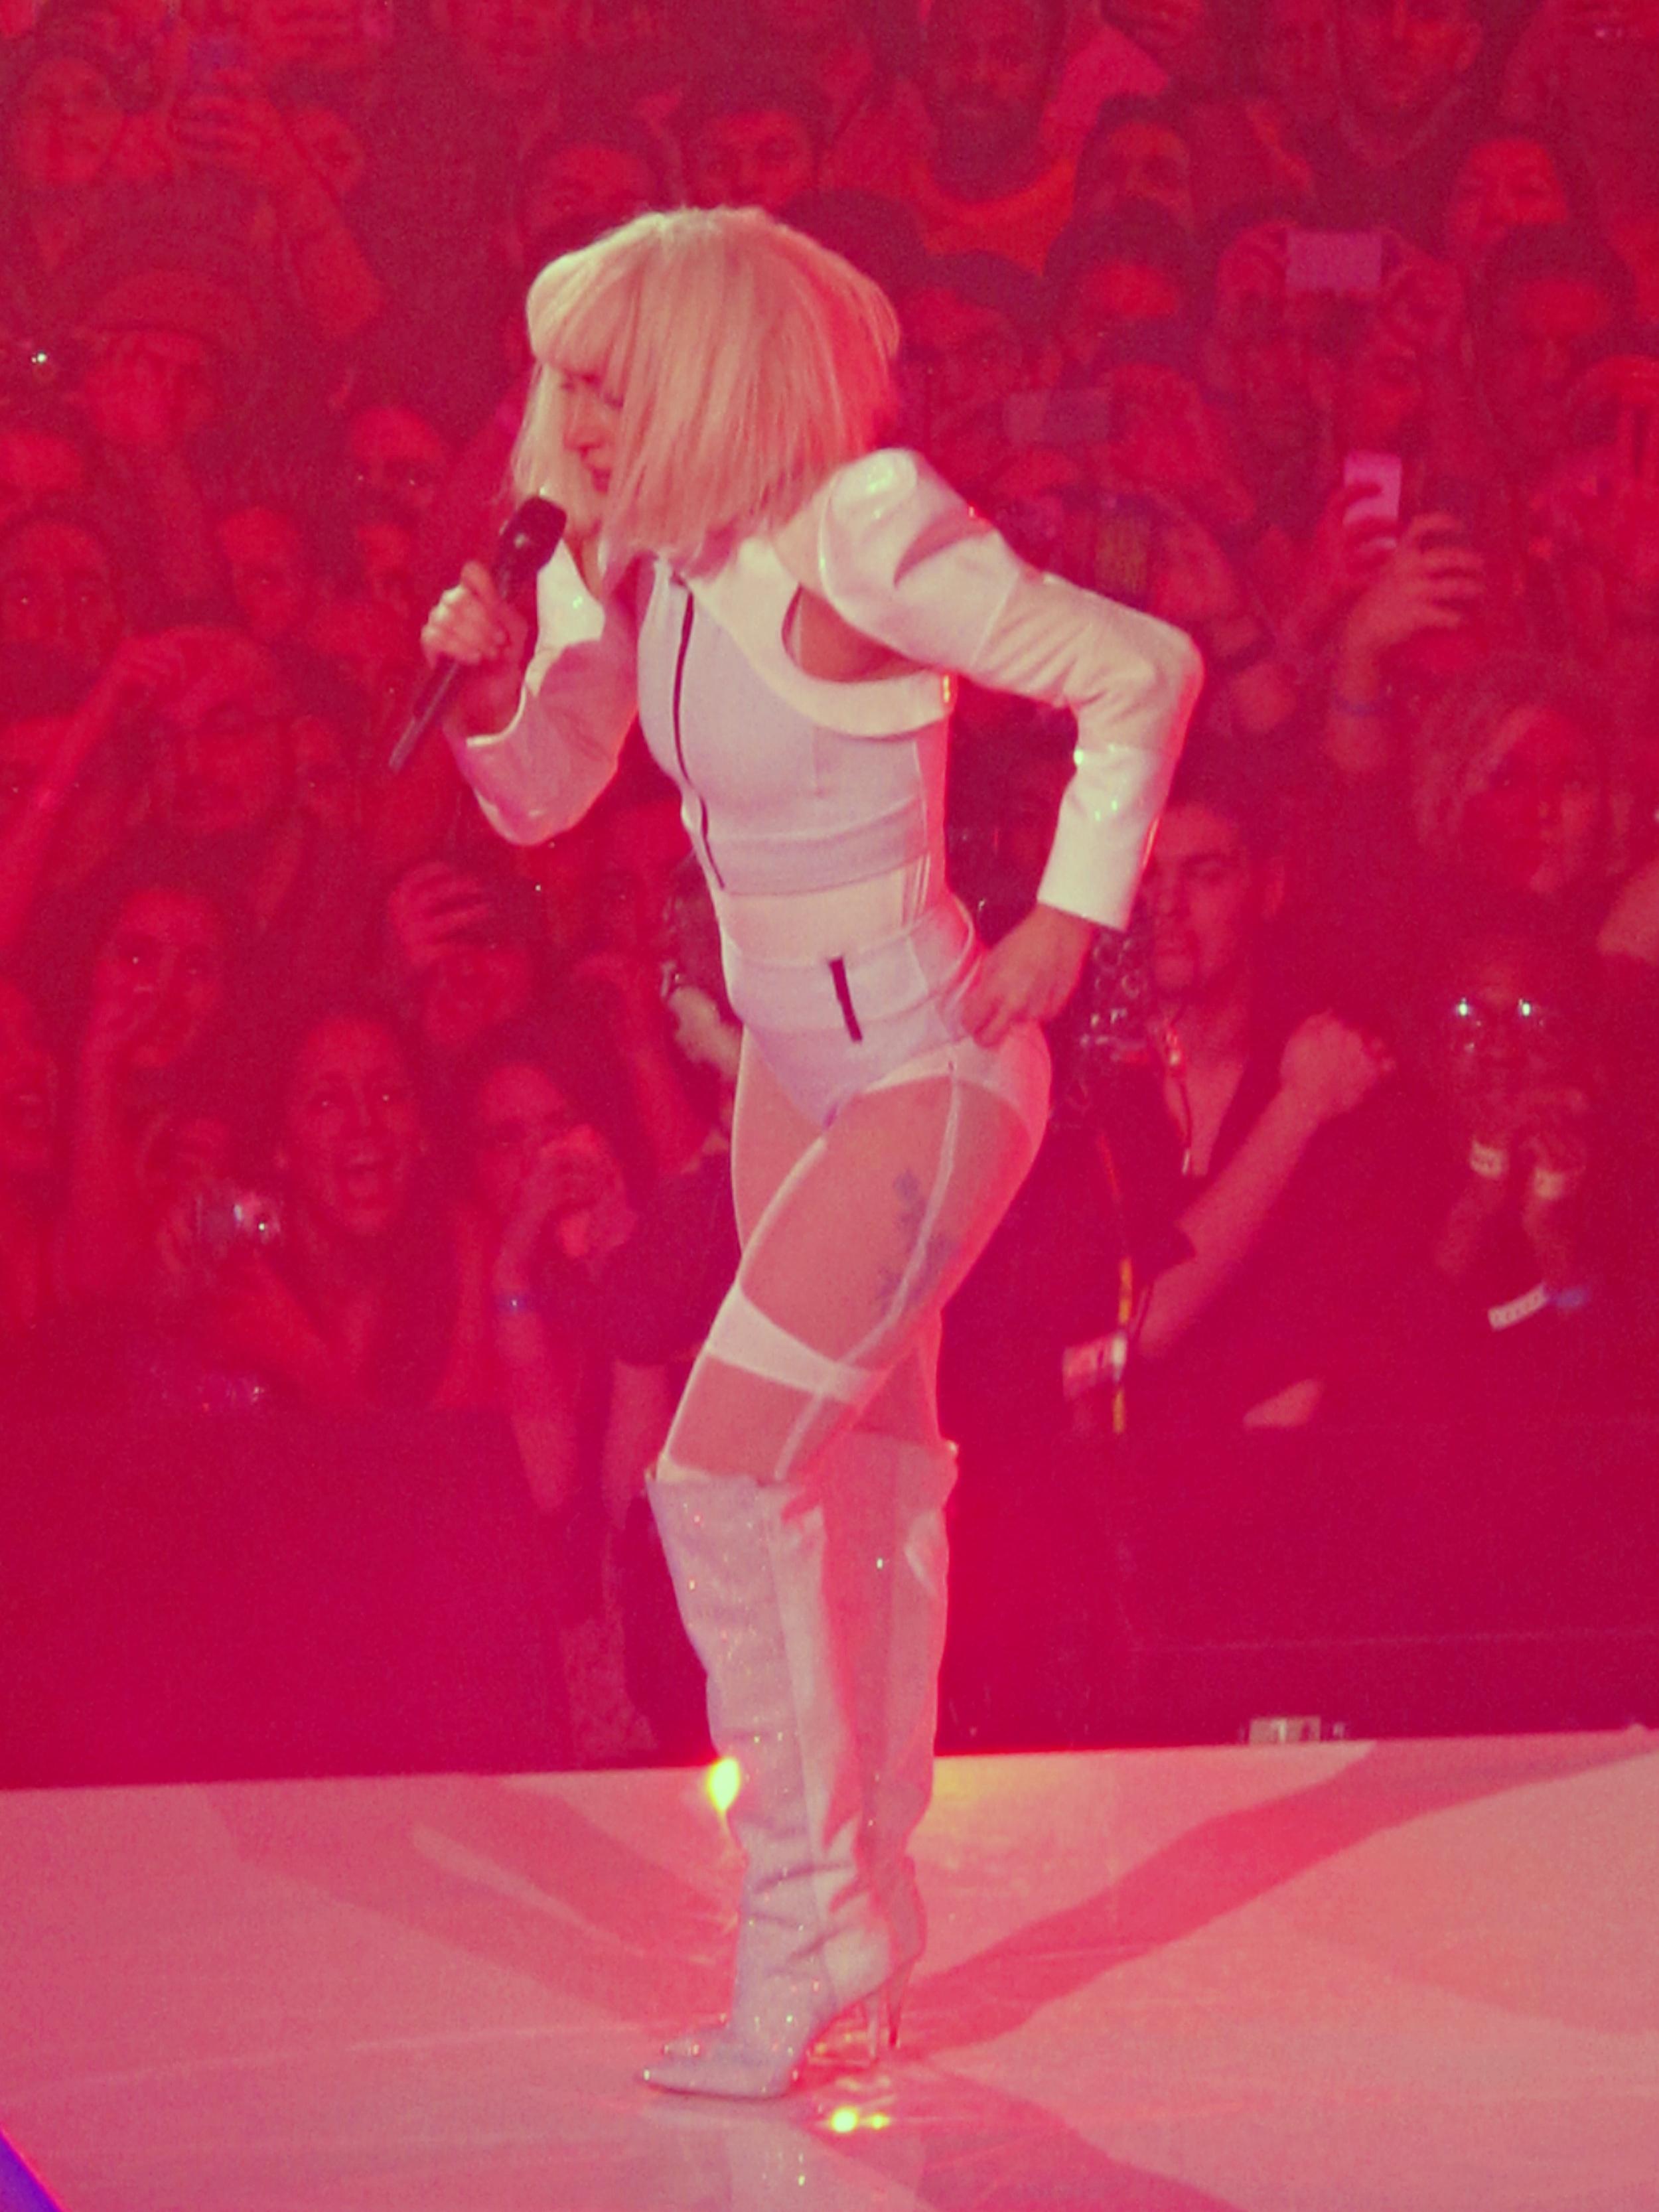 Maria-Brito_Lady-Gaga-Koons-Artrave-6.jpg